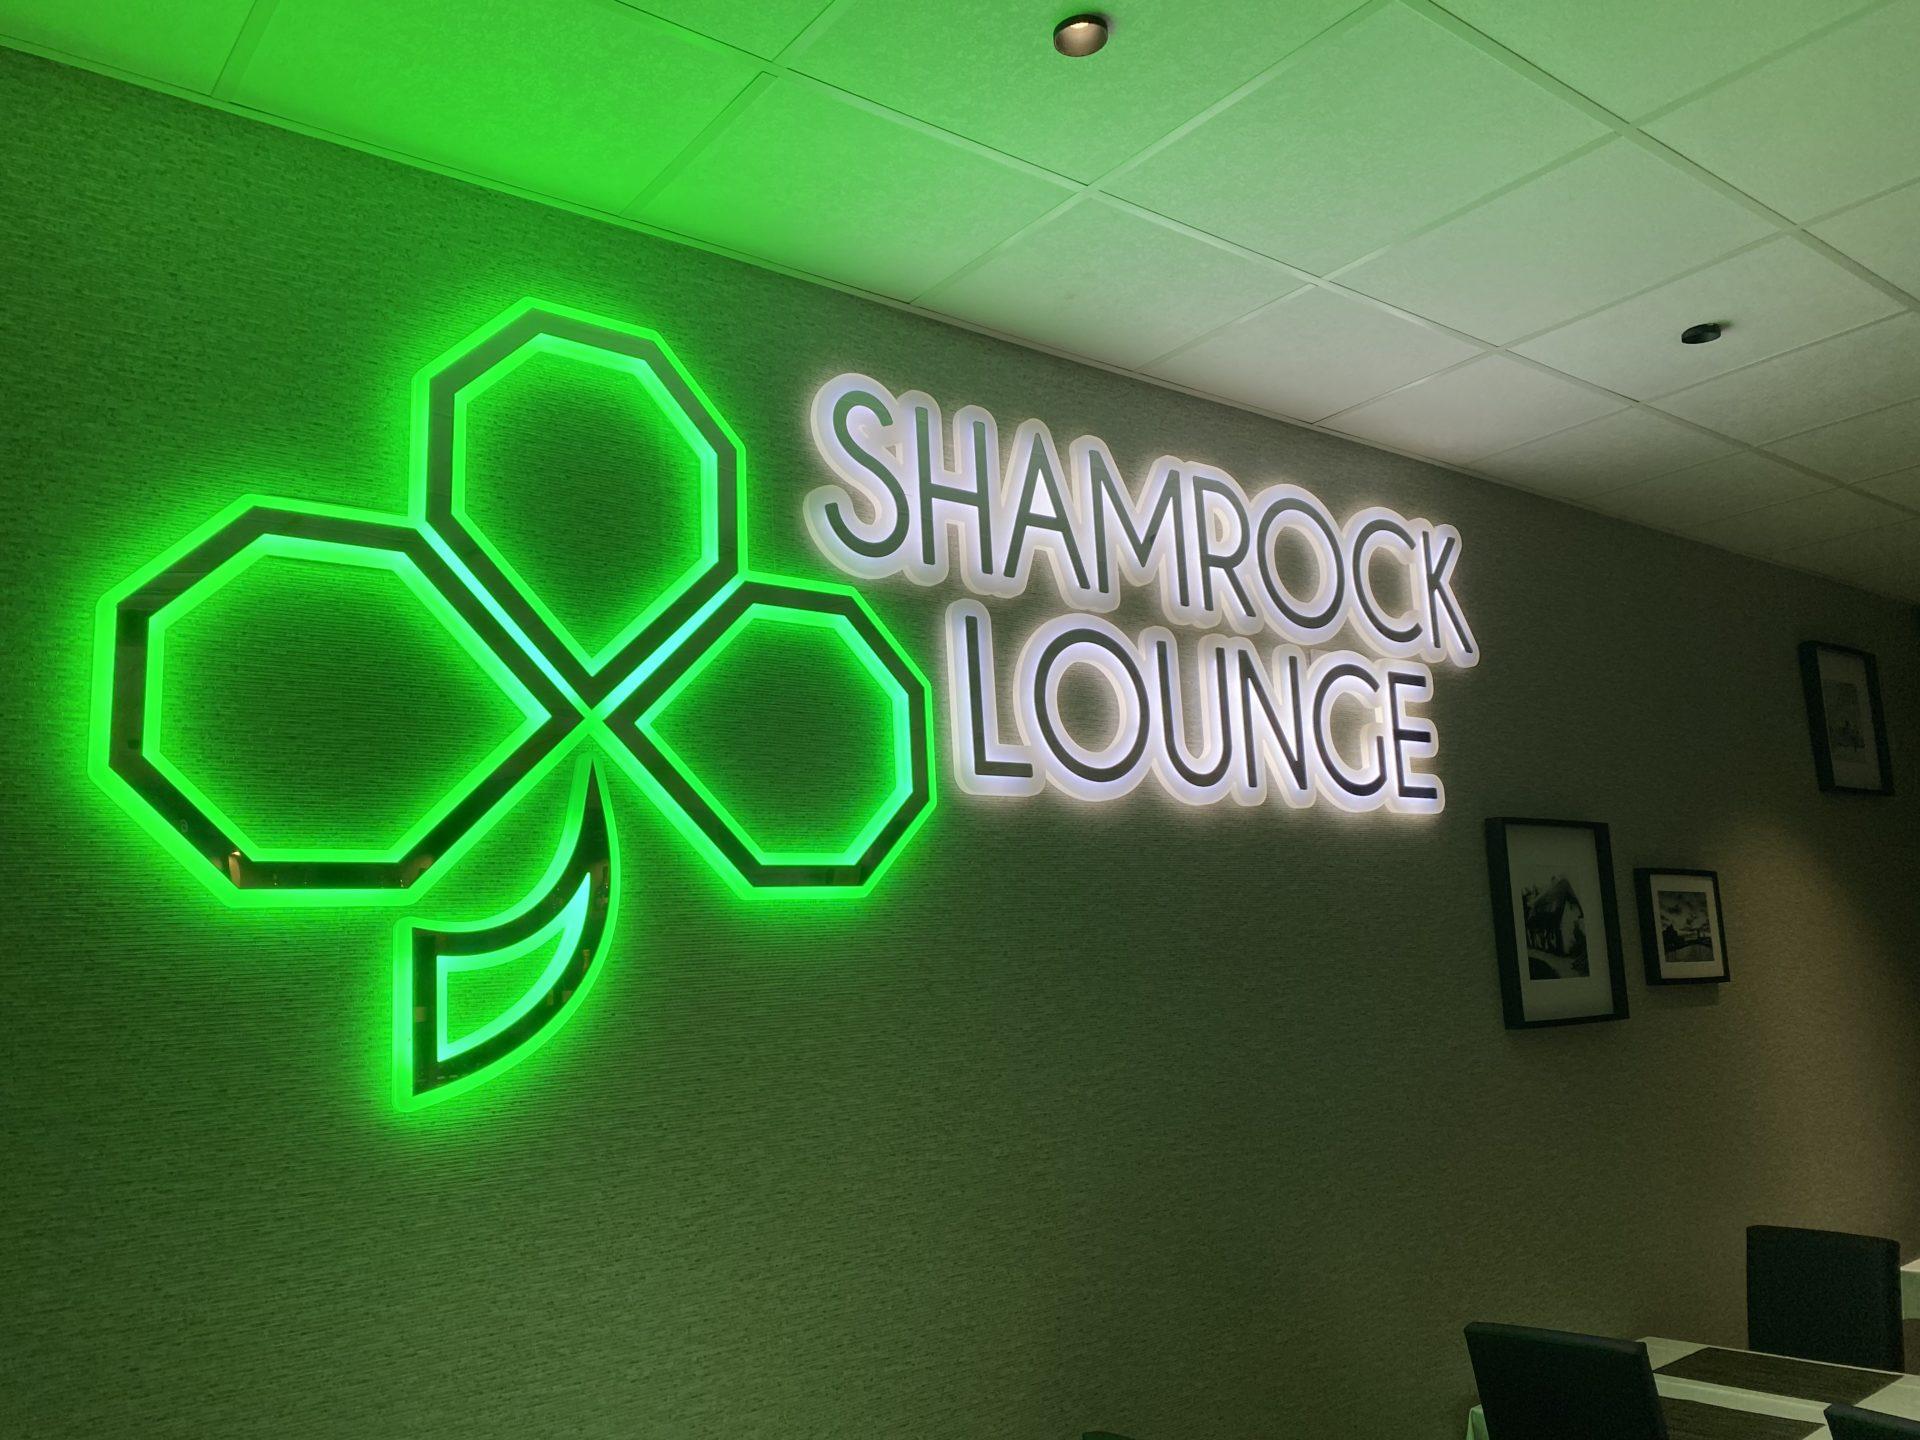 The Shamrock Lounge & Restaurant